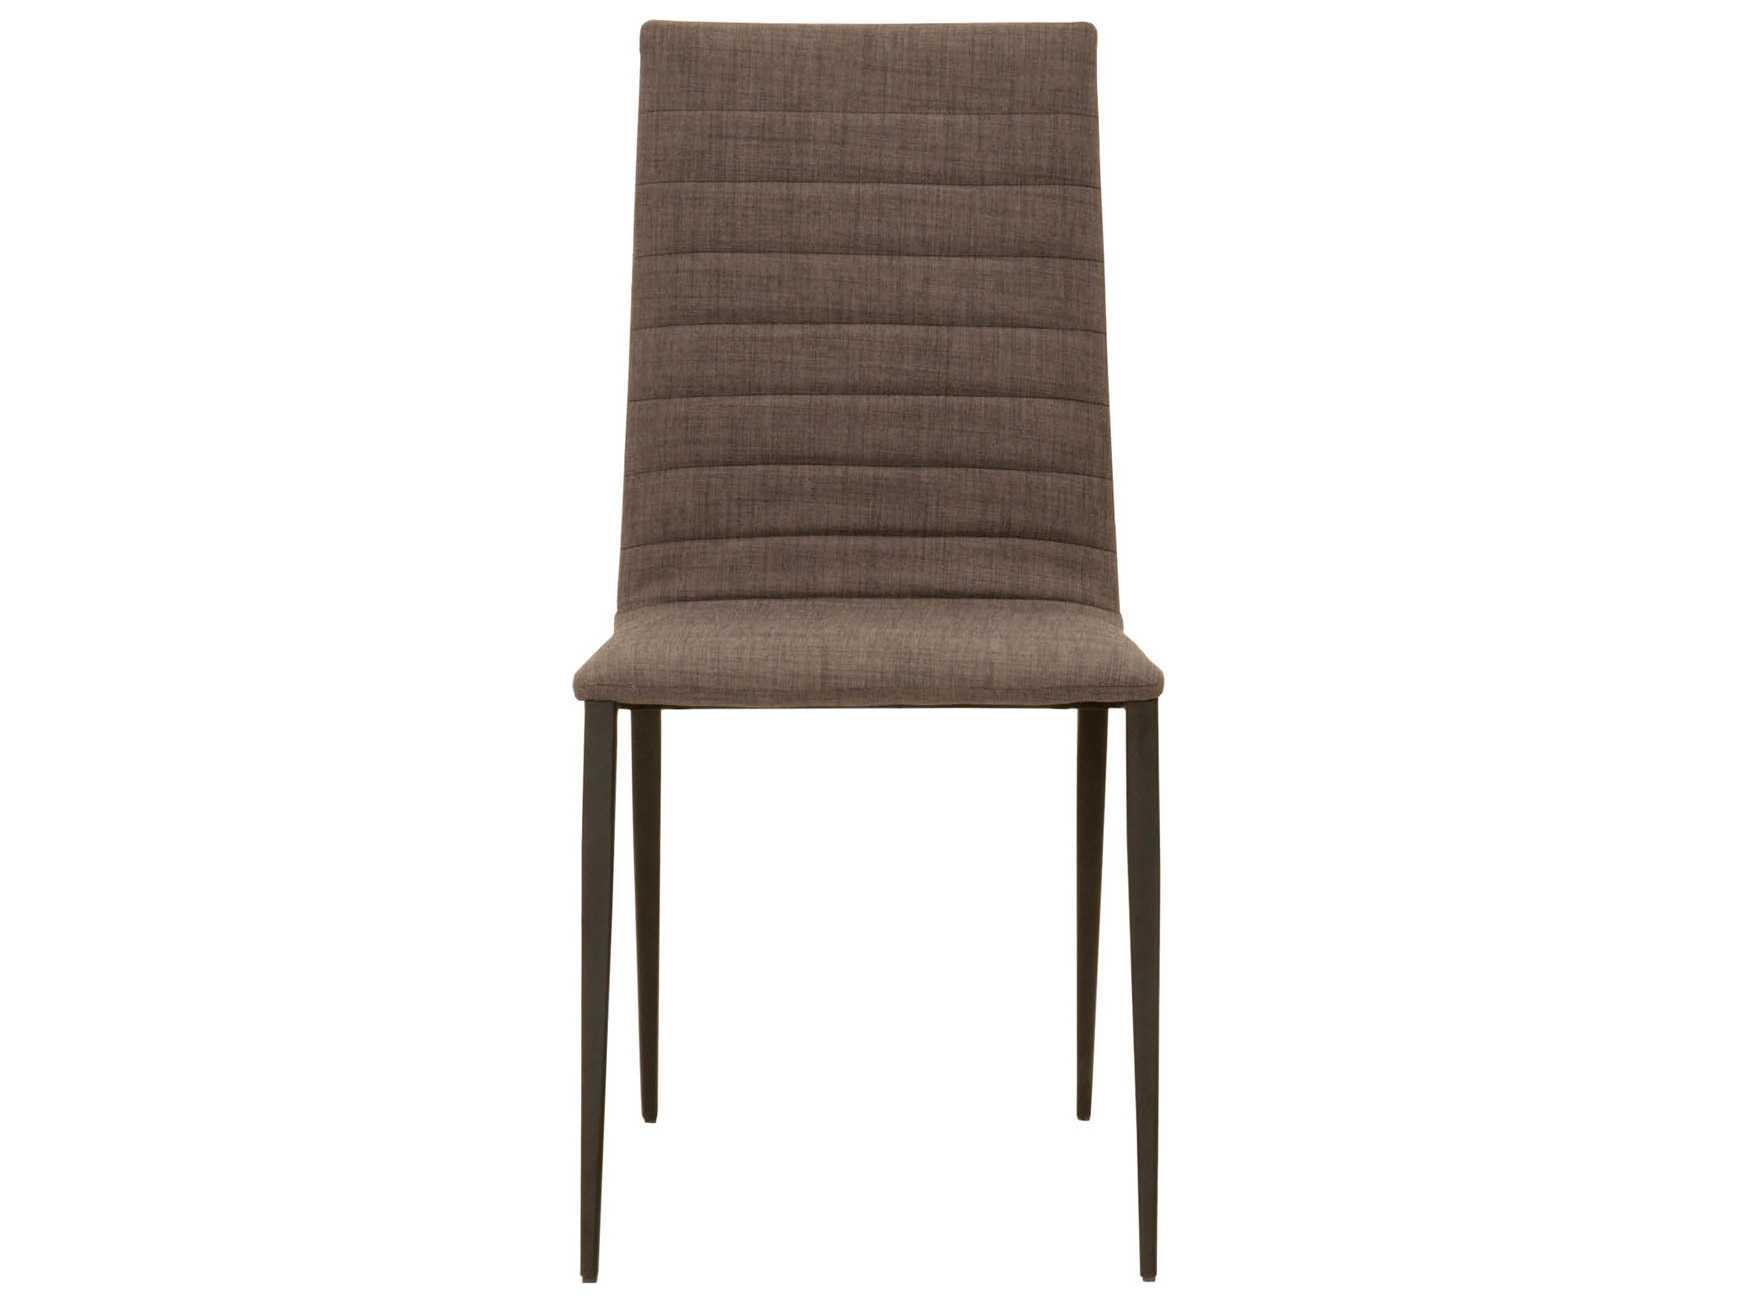 Star International Furniture Seasons Lagos Dining Room Set Sif1400dtmhgbset3